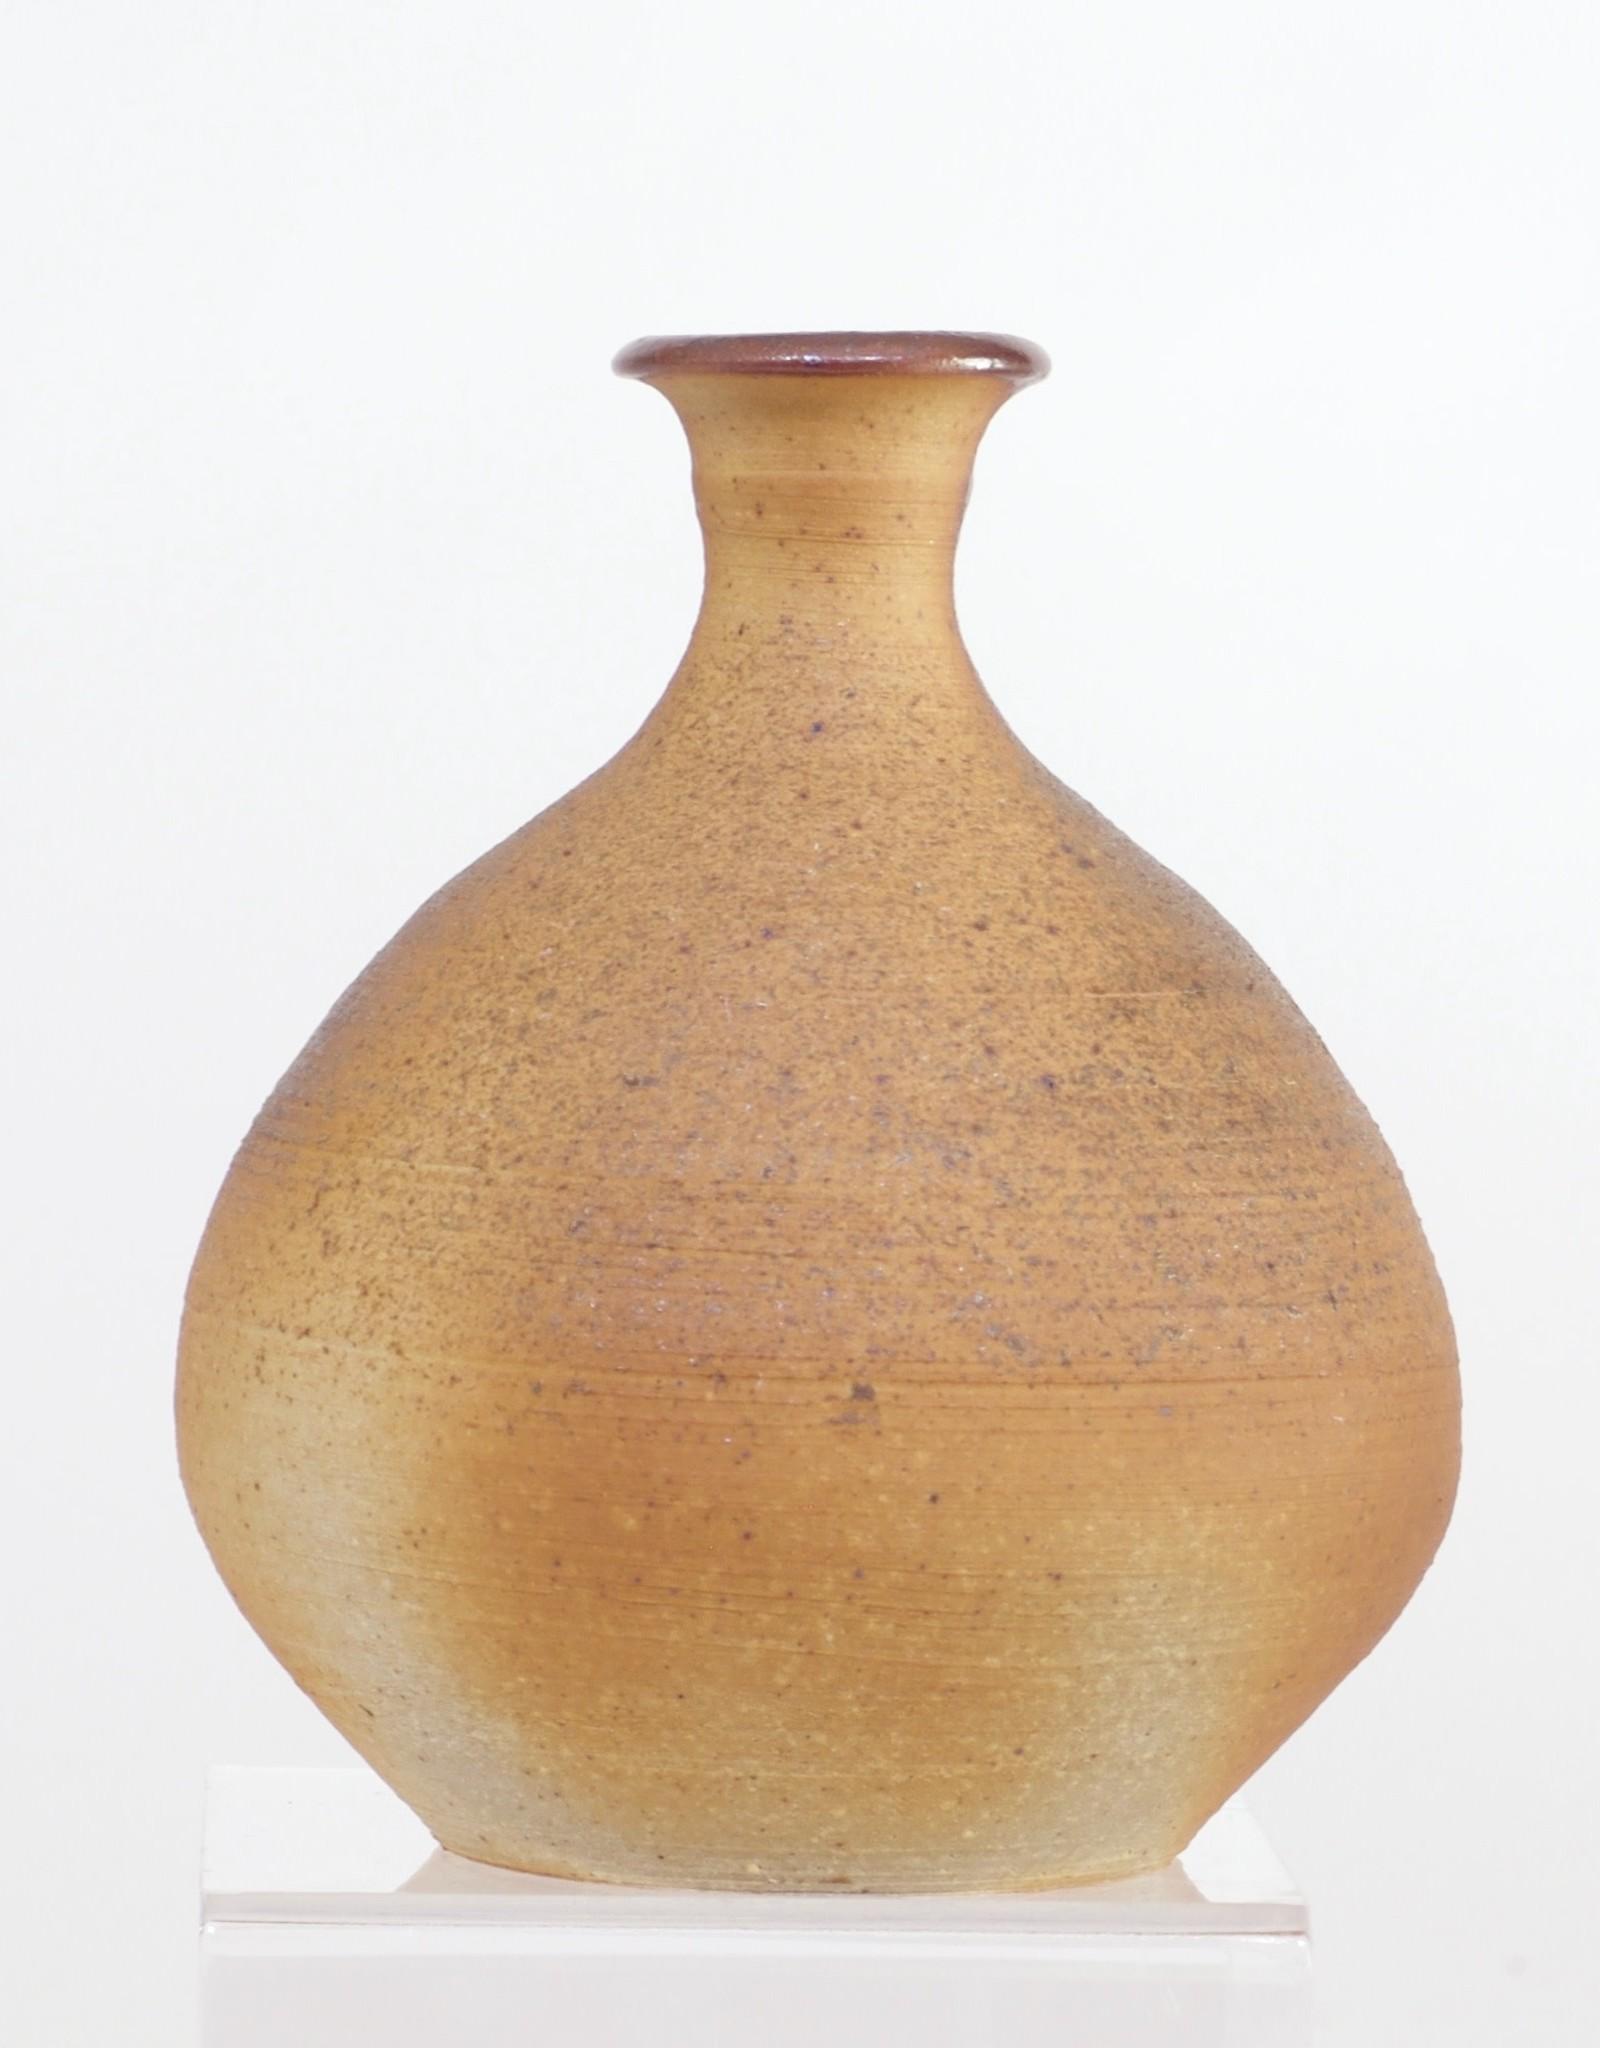 Bradley Walters Brown Rough Textured Small Vase